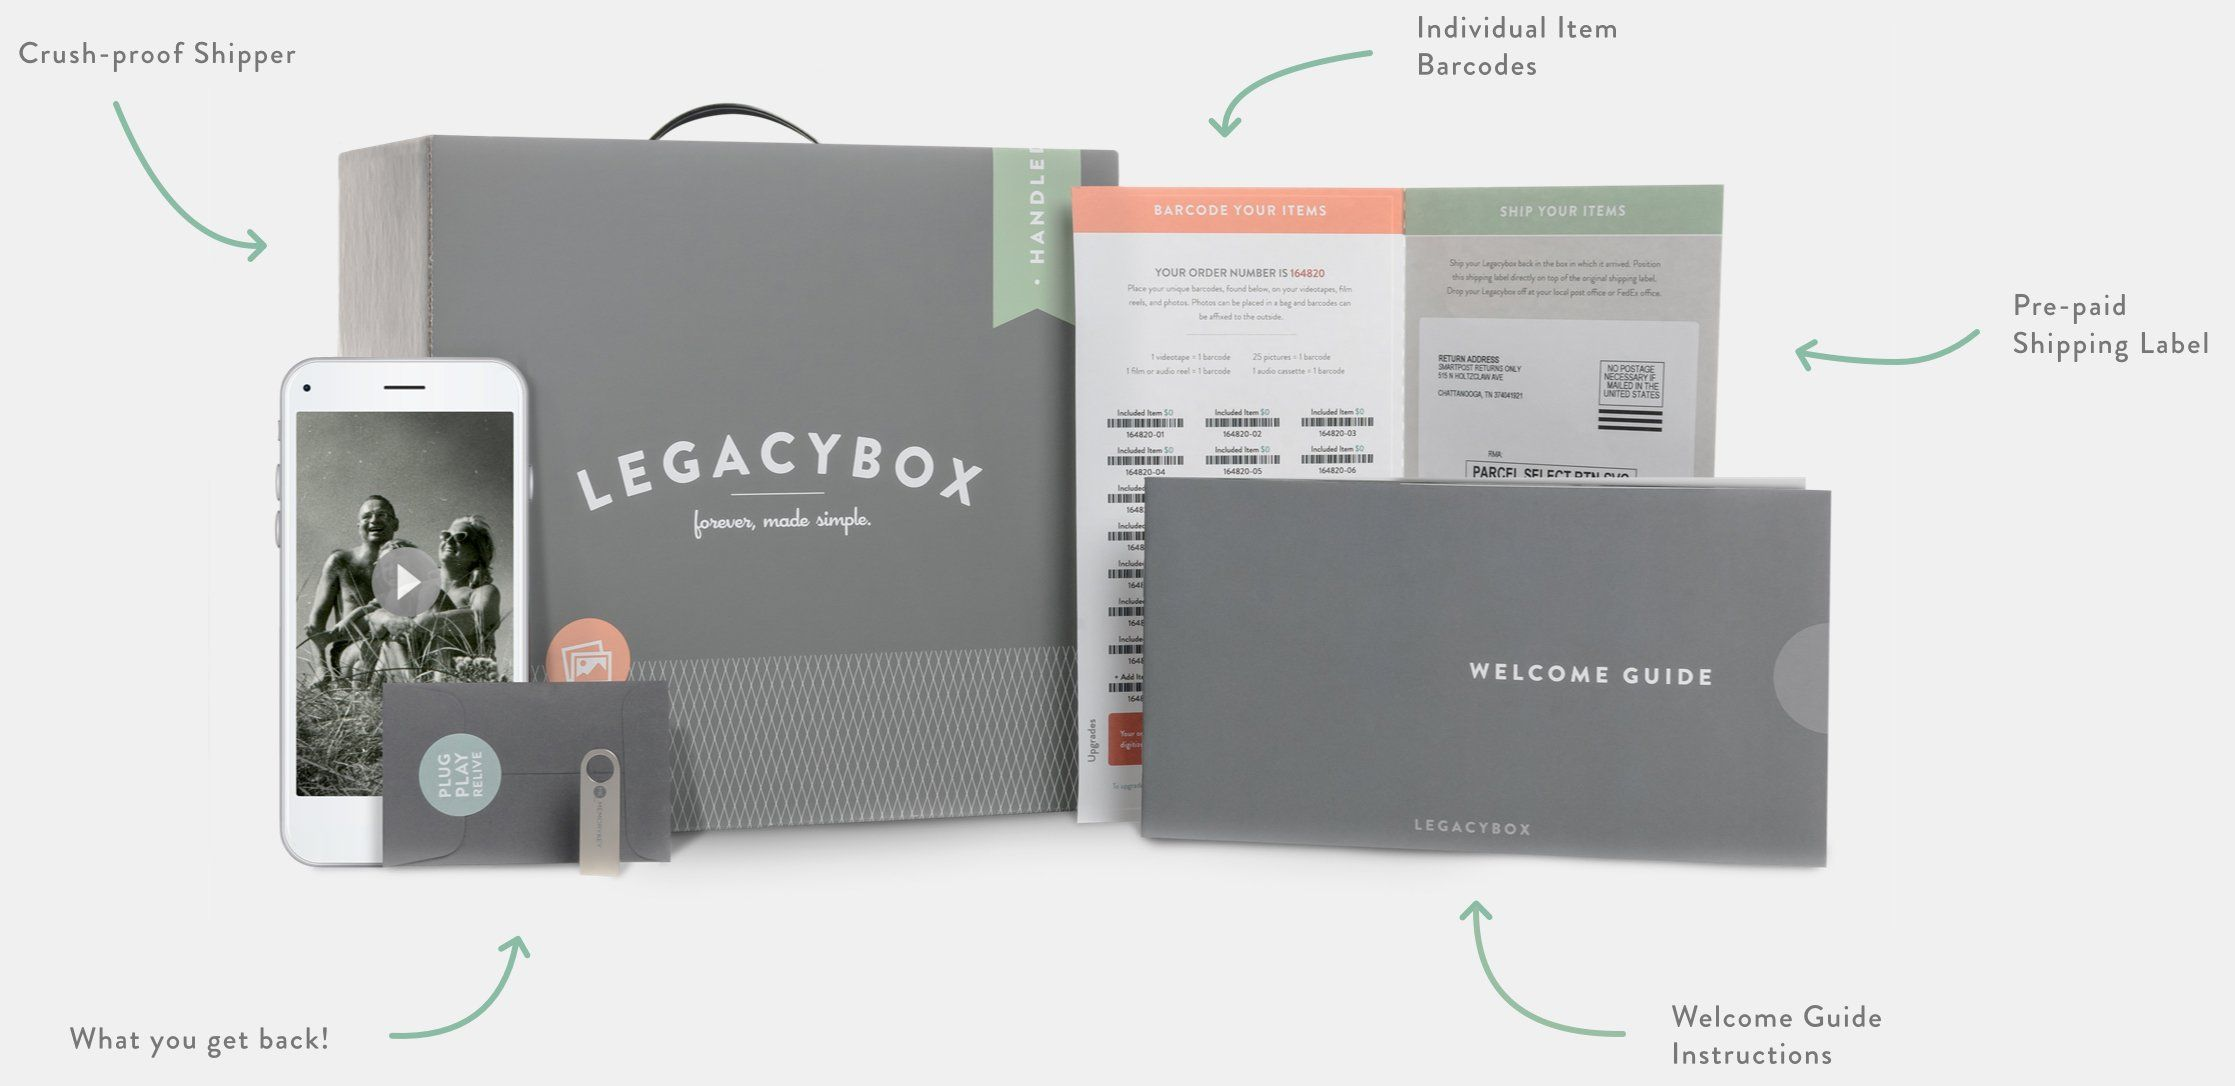 Shop Legacybox Legacybox, Mailing labels, Labels